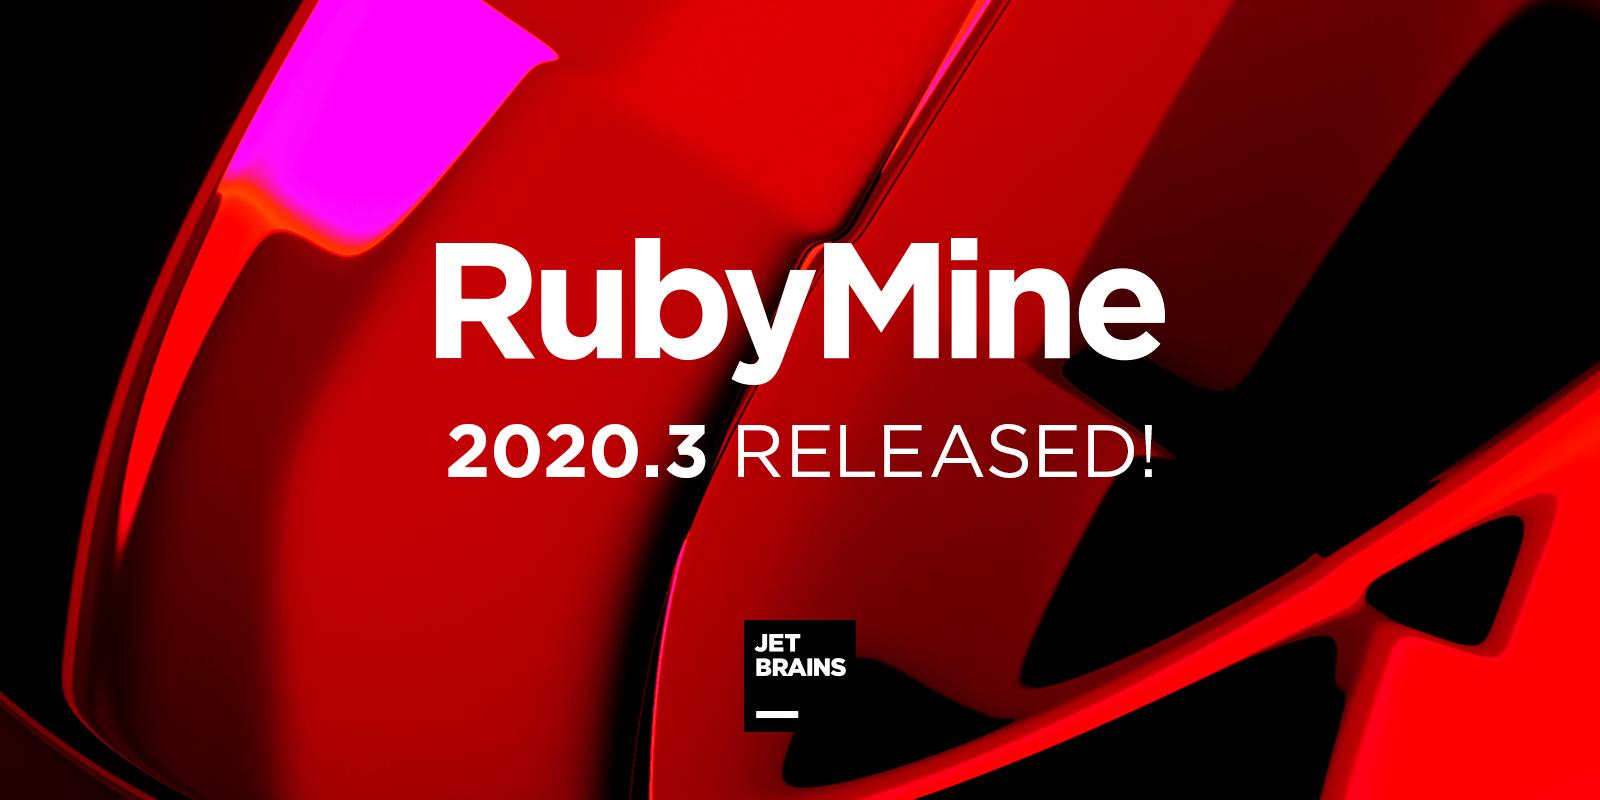 RubyMine 2020.3 released